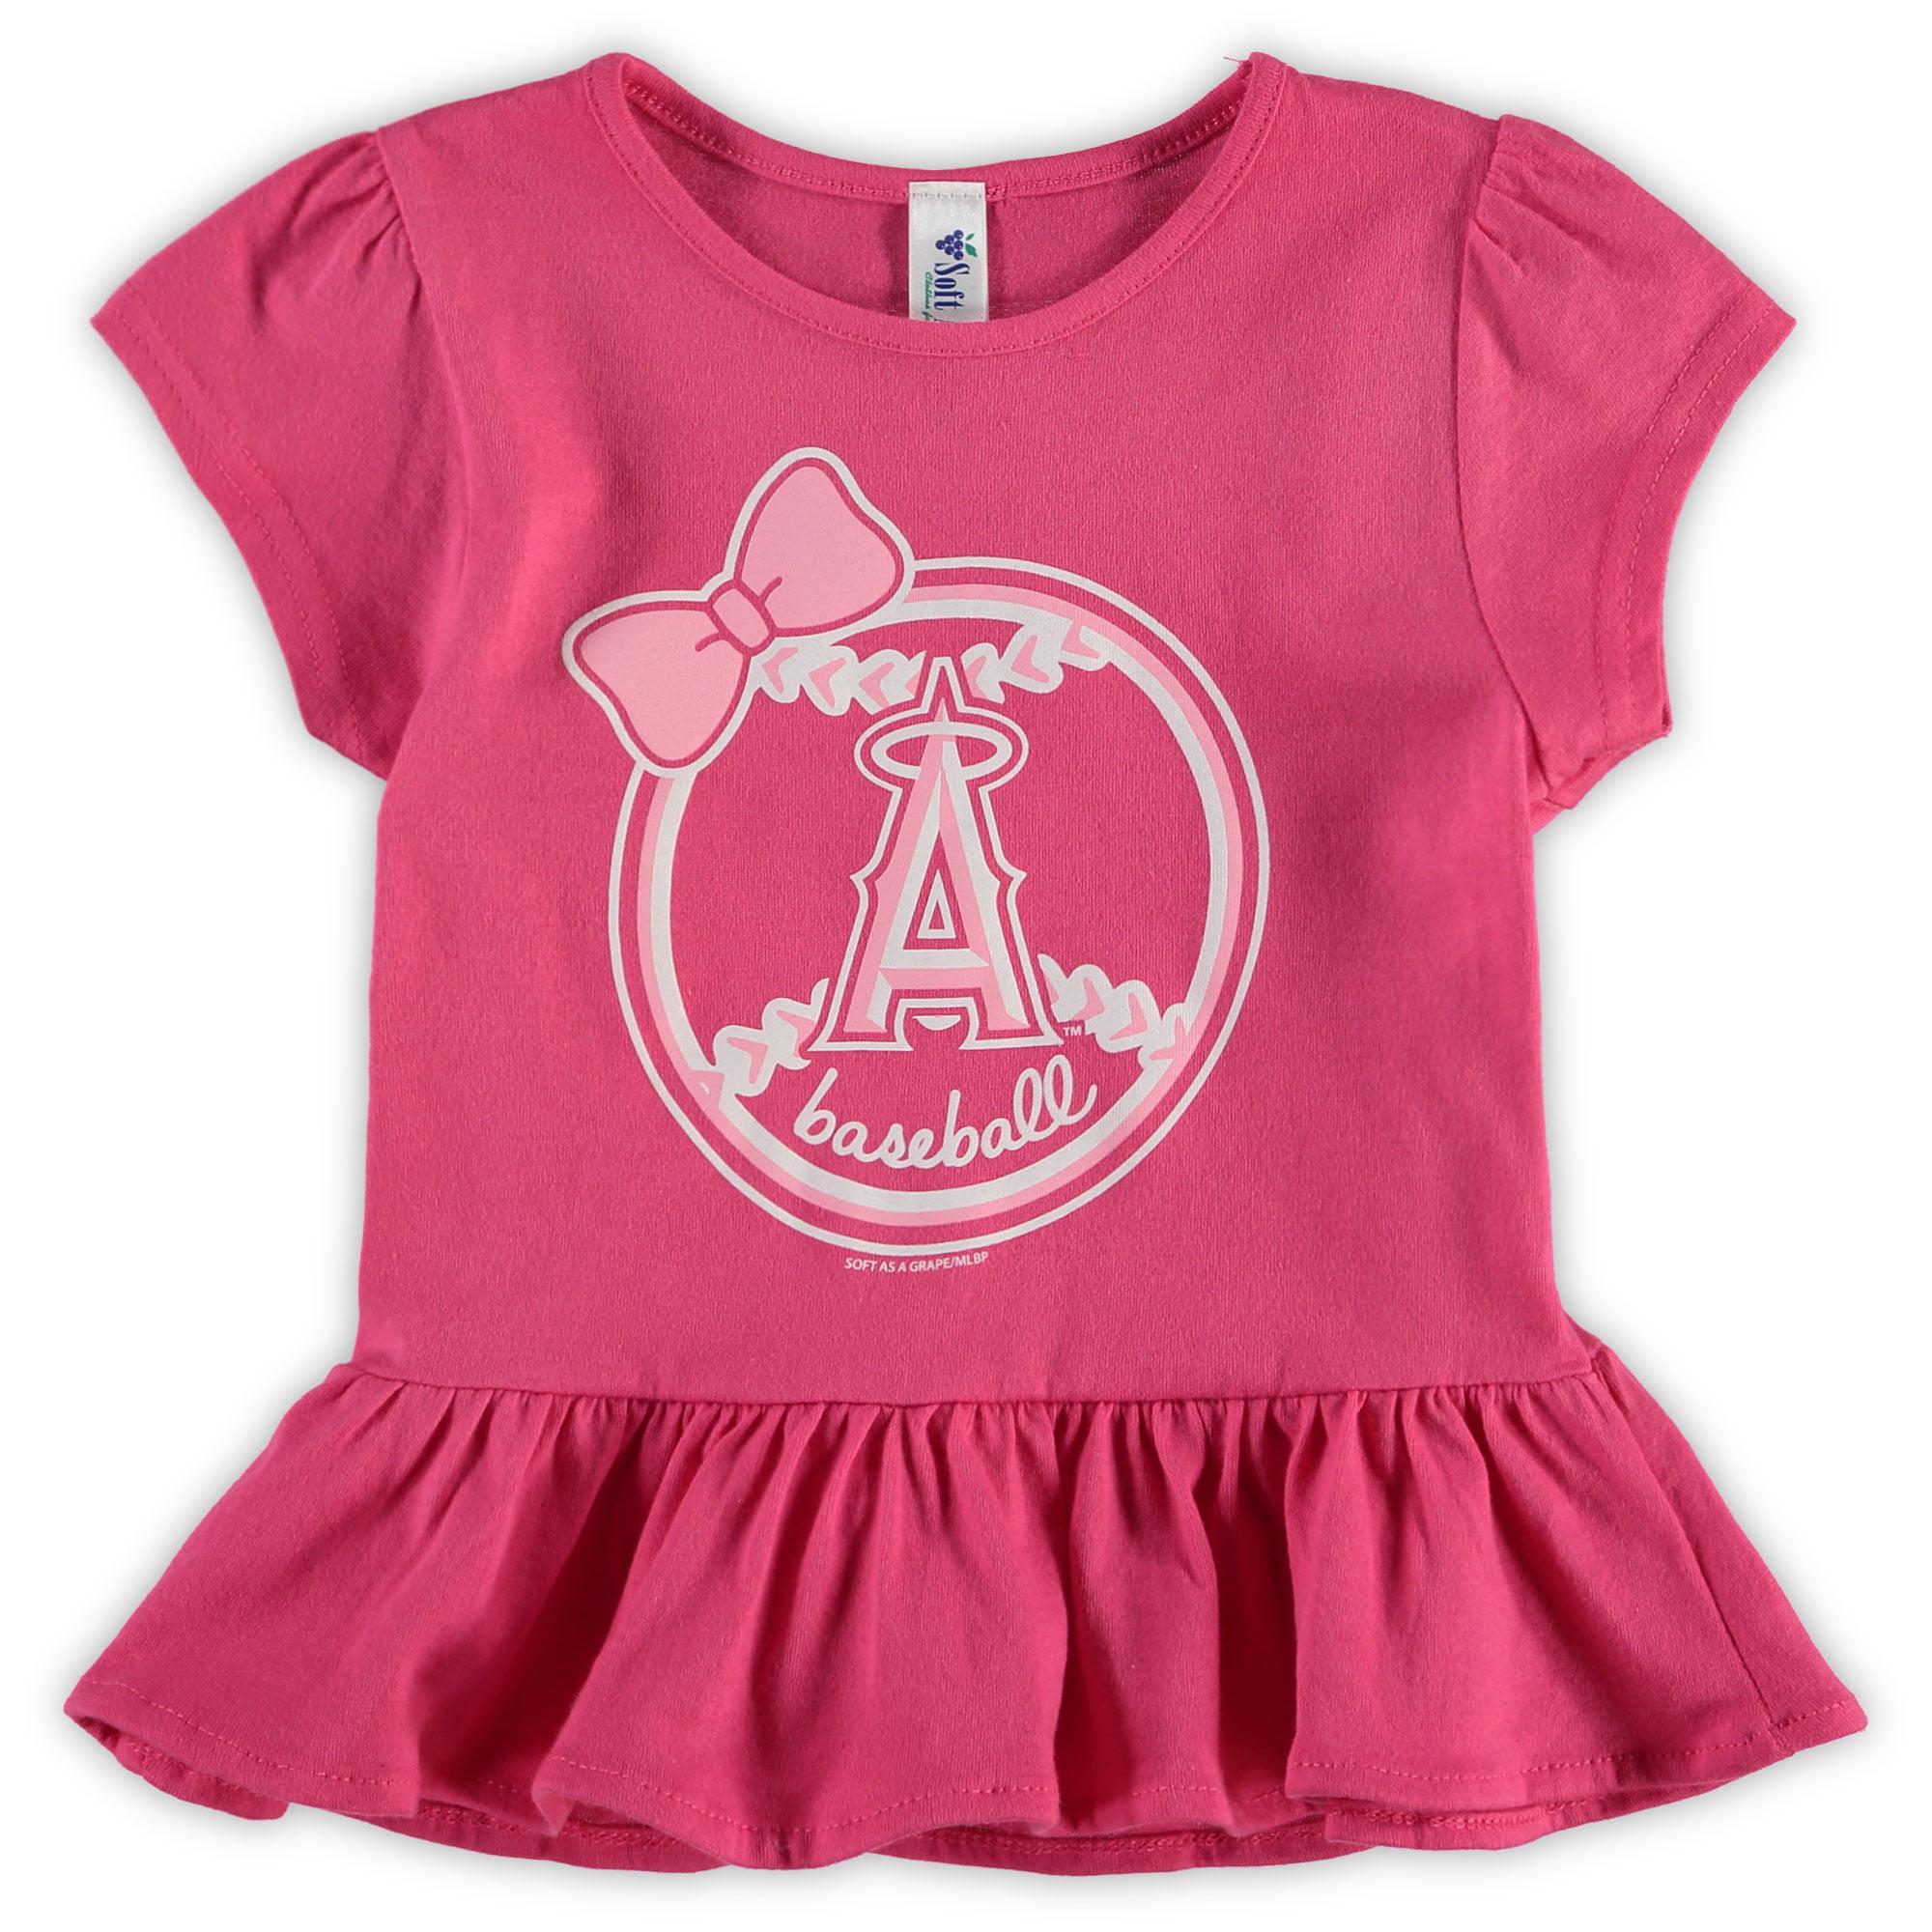 Los Angeles Angels Soft as a Grape Girls Toddler Ruffle T-Shirt - Pink